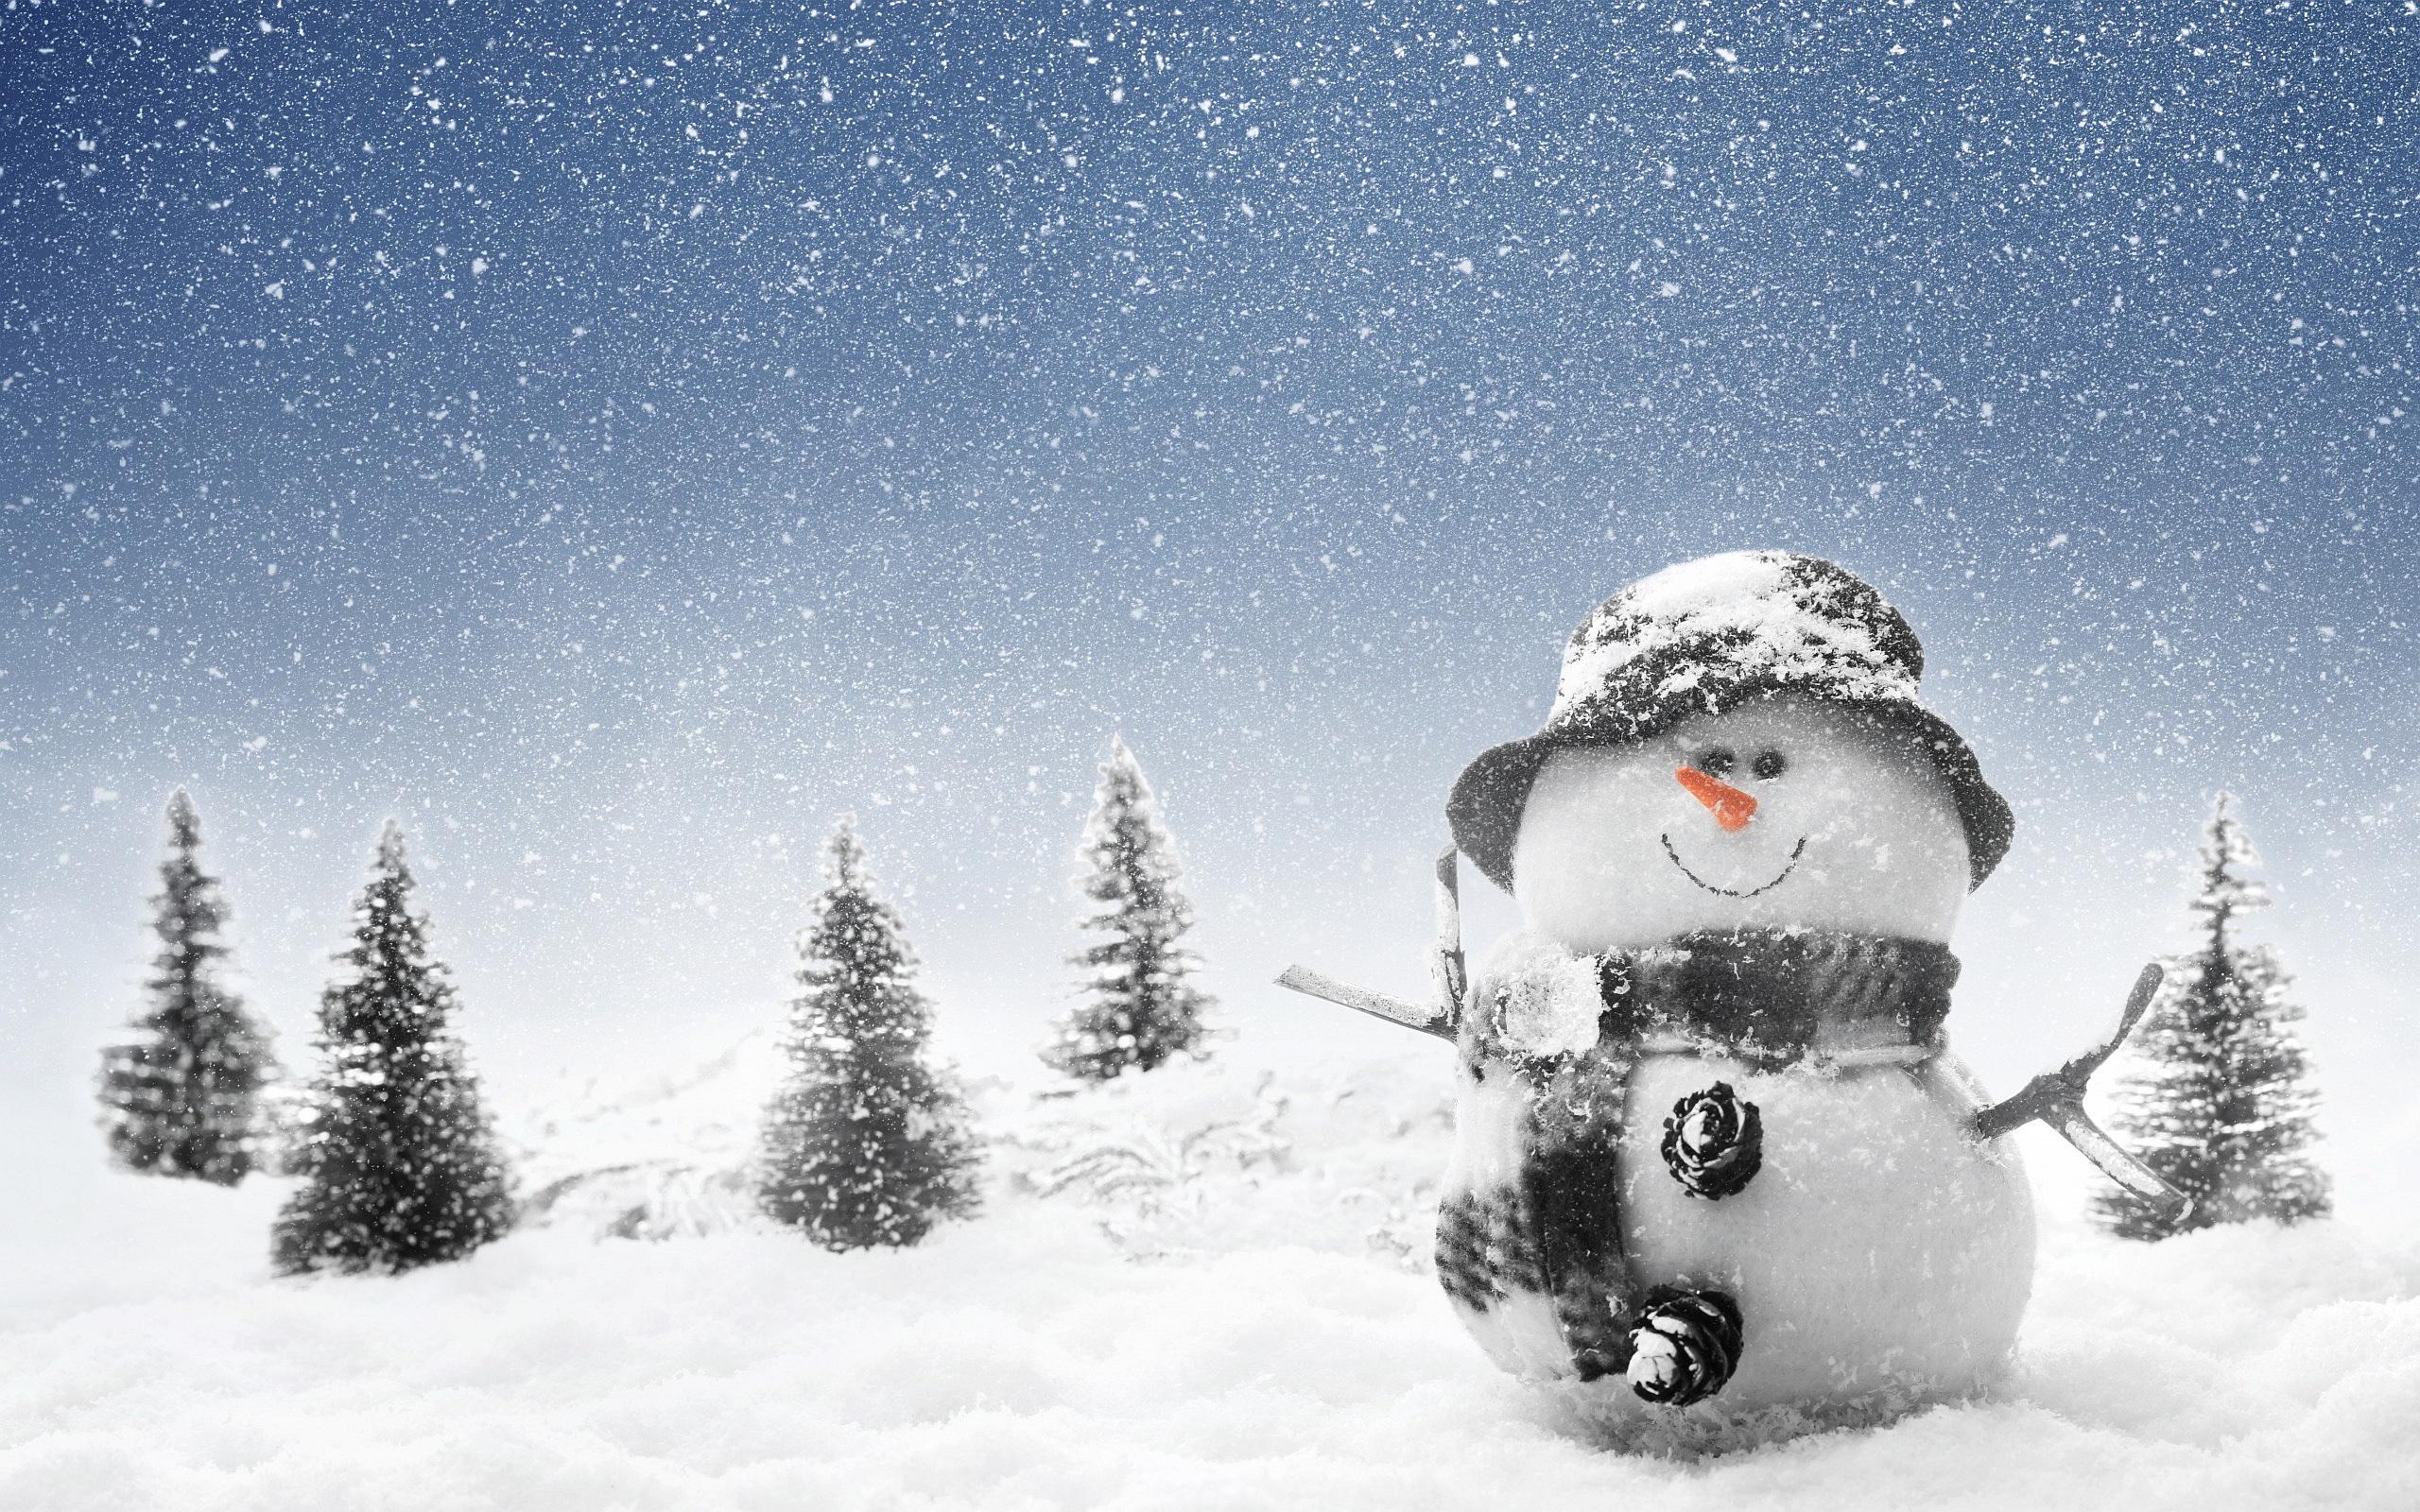 Winter Snowmans Pictures Photos Images Picture PPT Backgrounds